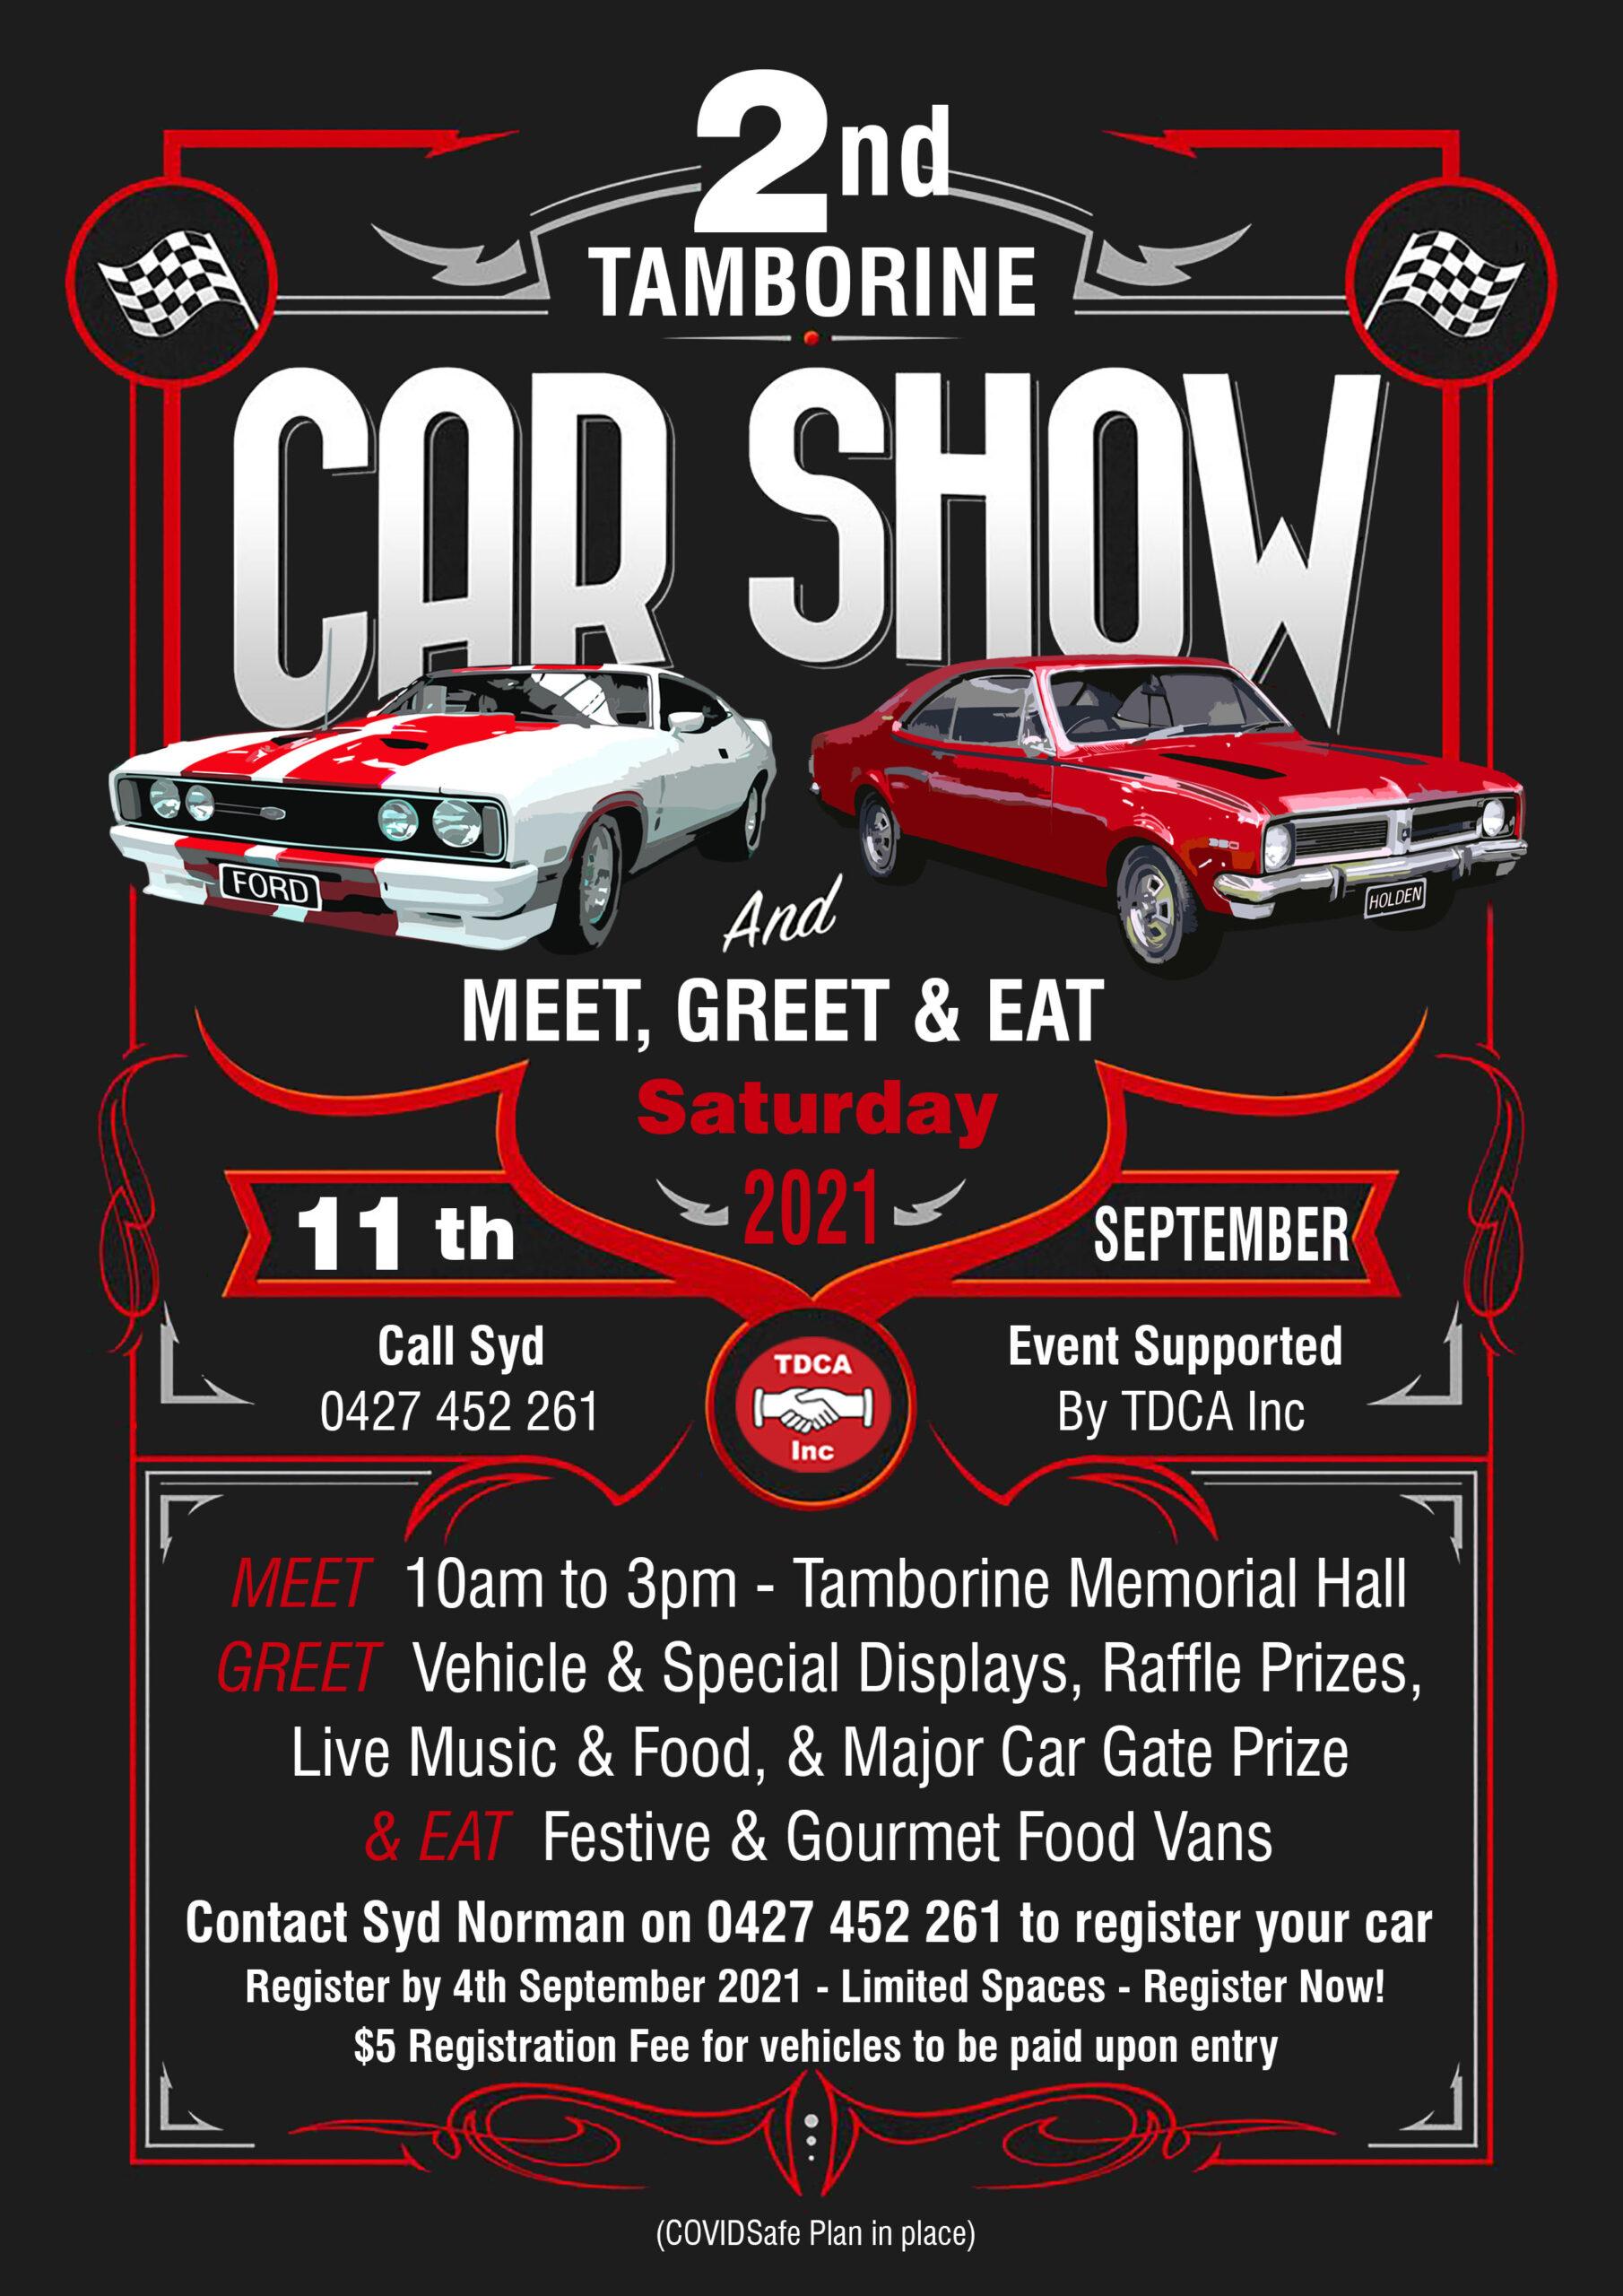 Tamborine's 2nd Annual Car Show